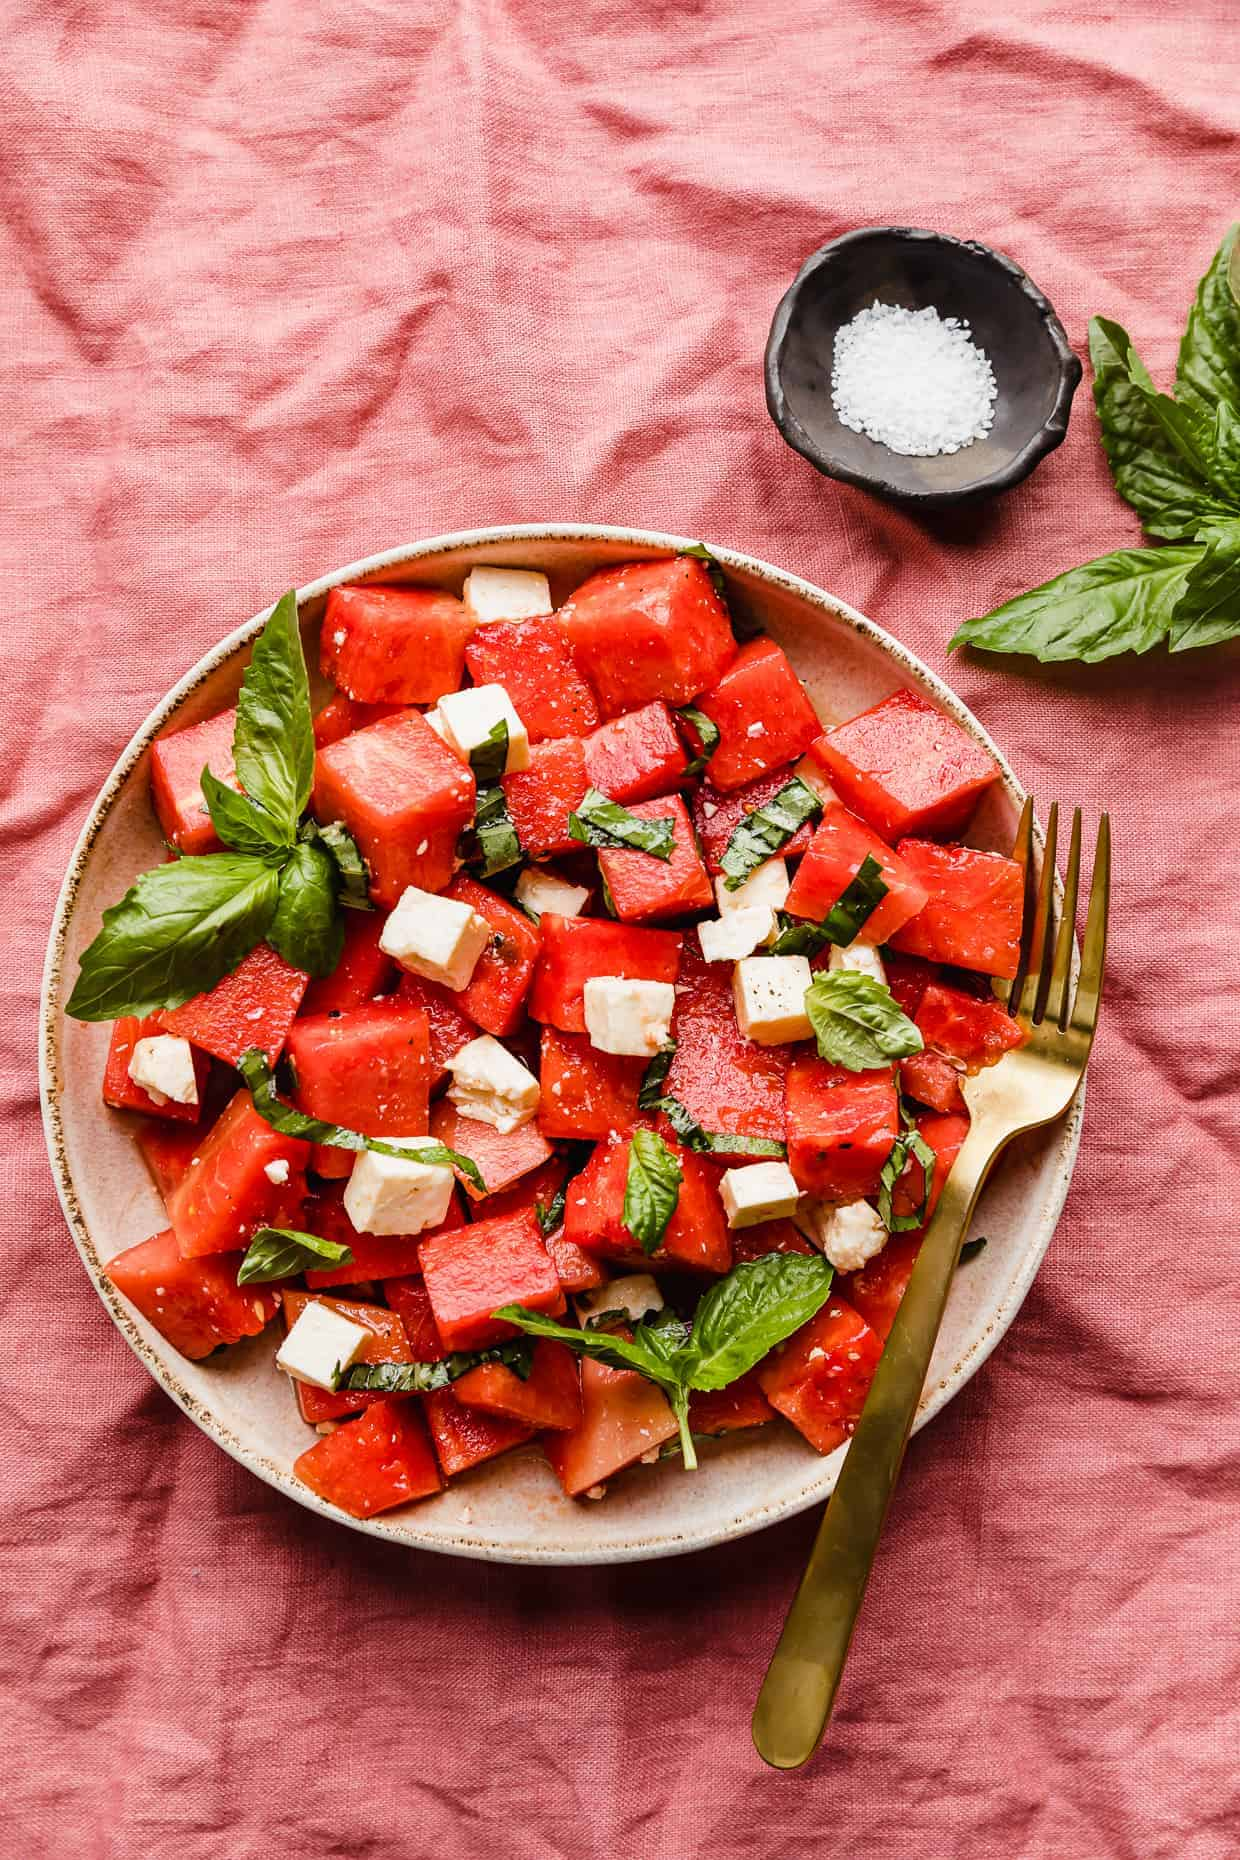 A Watermelon Feta Basil Salad on large plate.